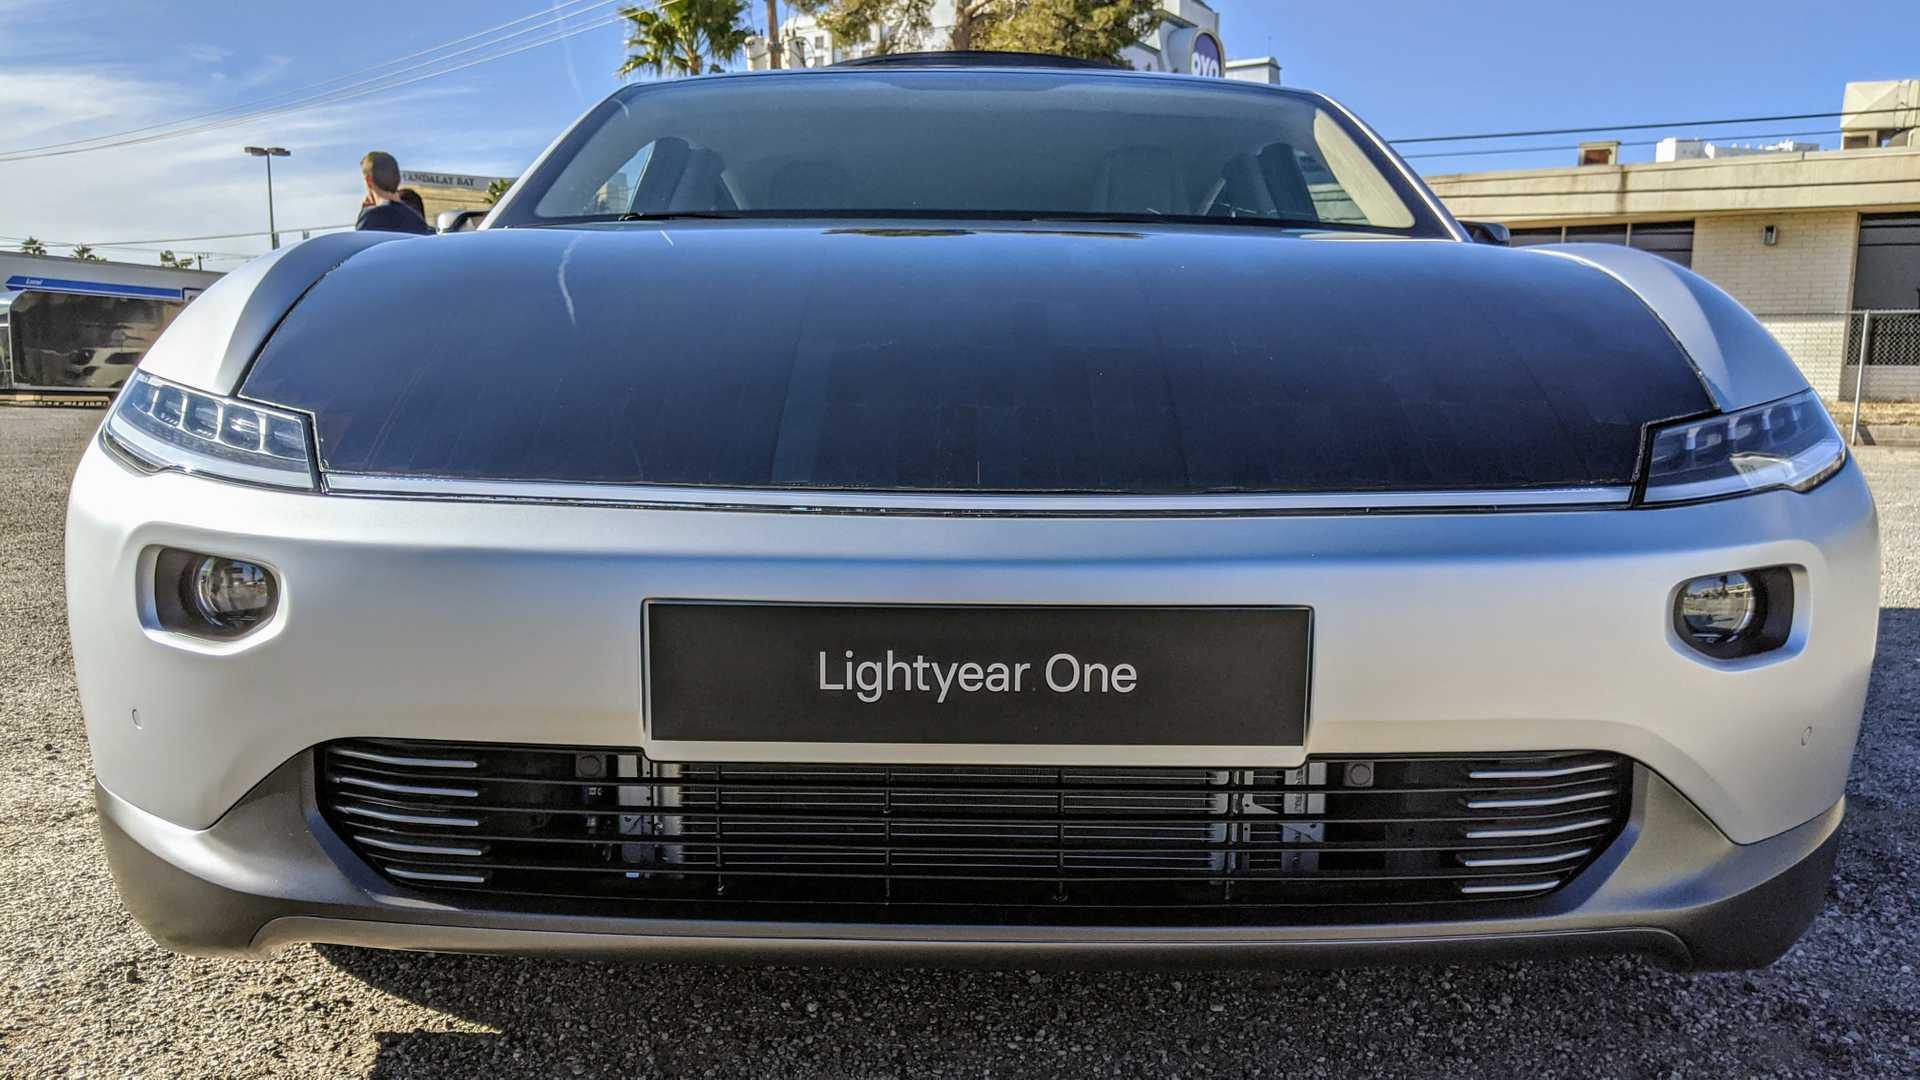 lightyear-one